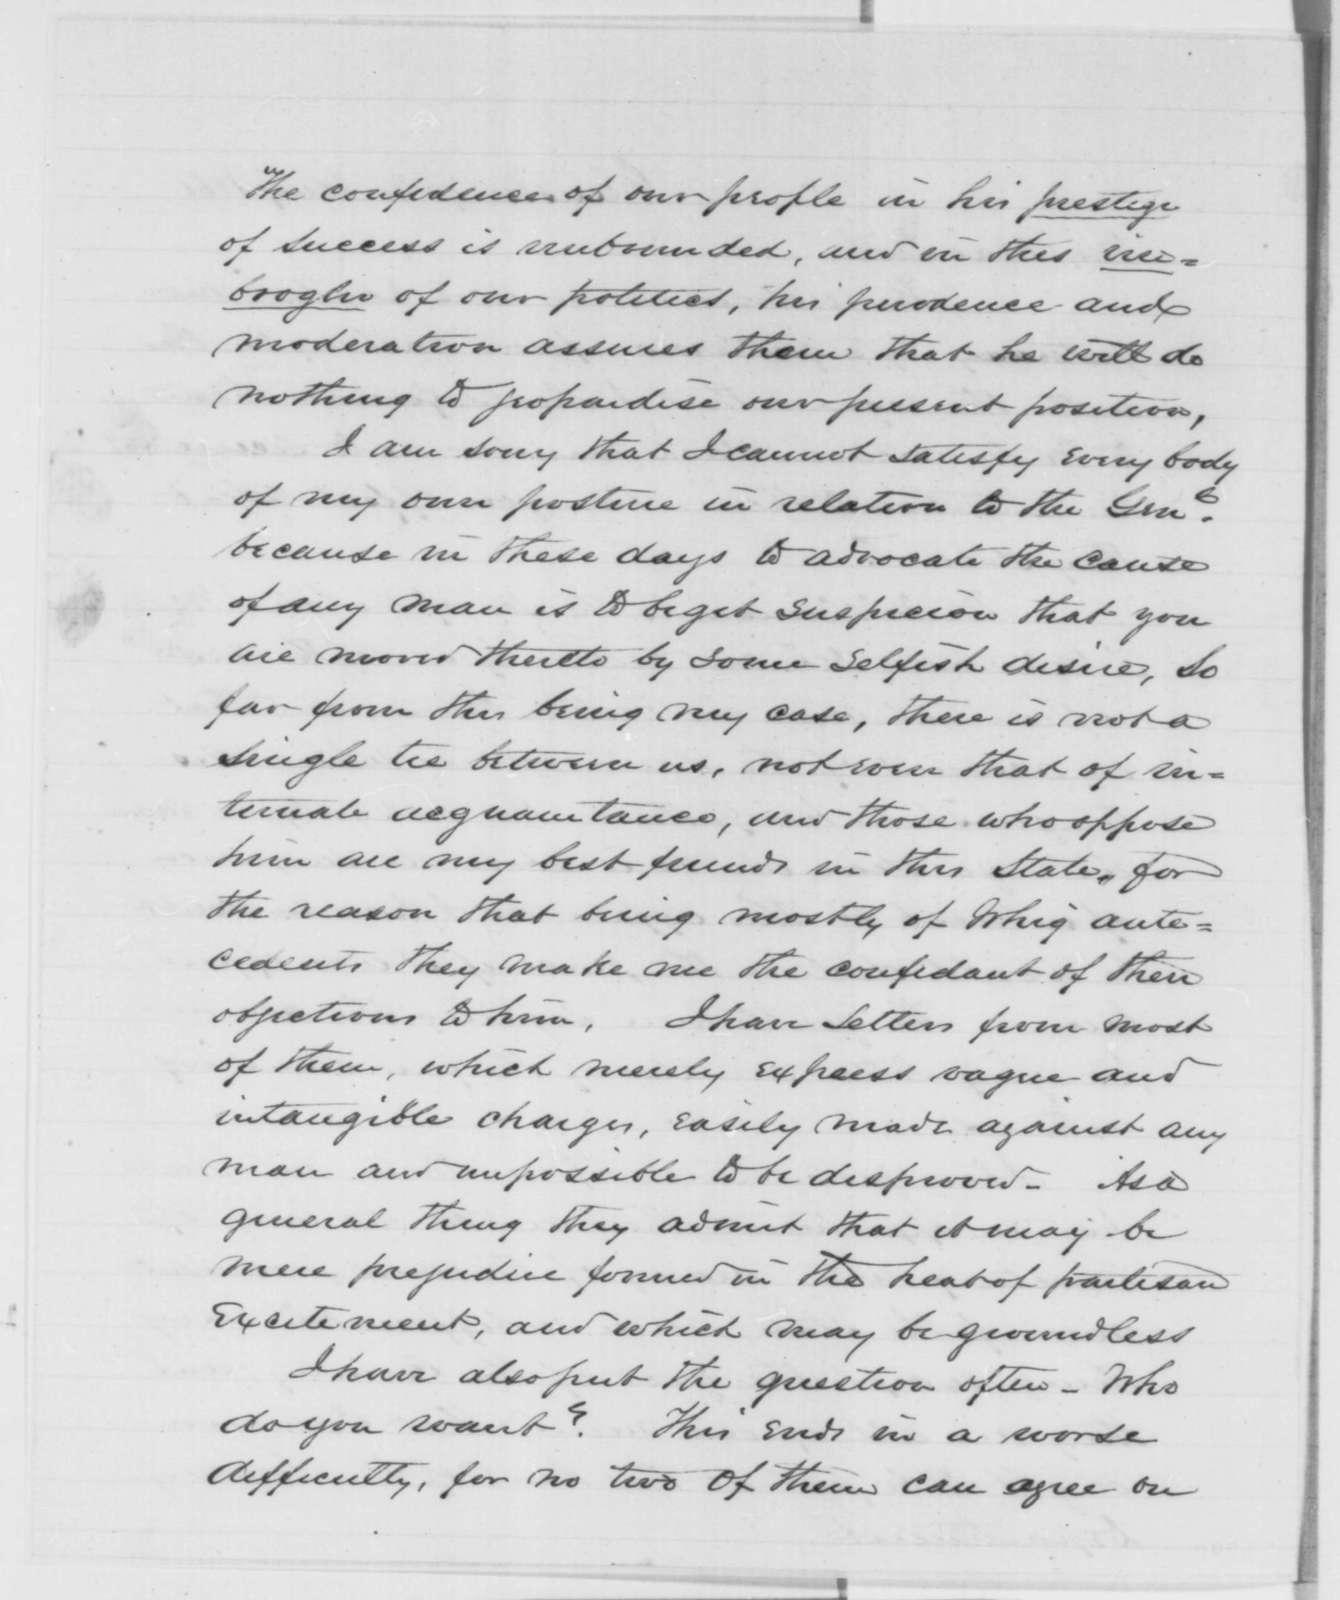 Edgar Cowan to David Davis, Wednesday, January 30, 1861  (Cameron)